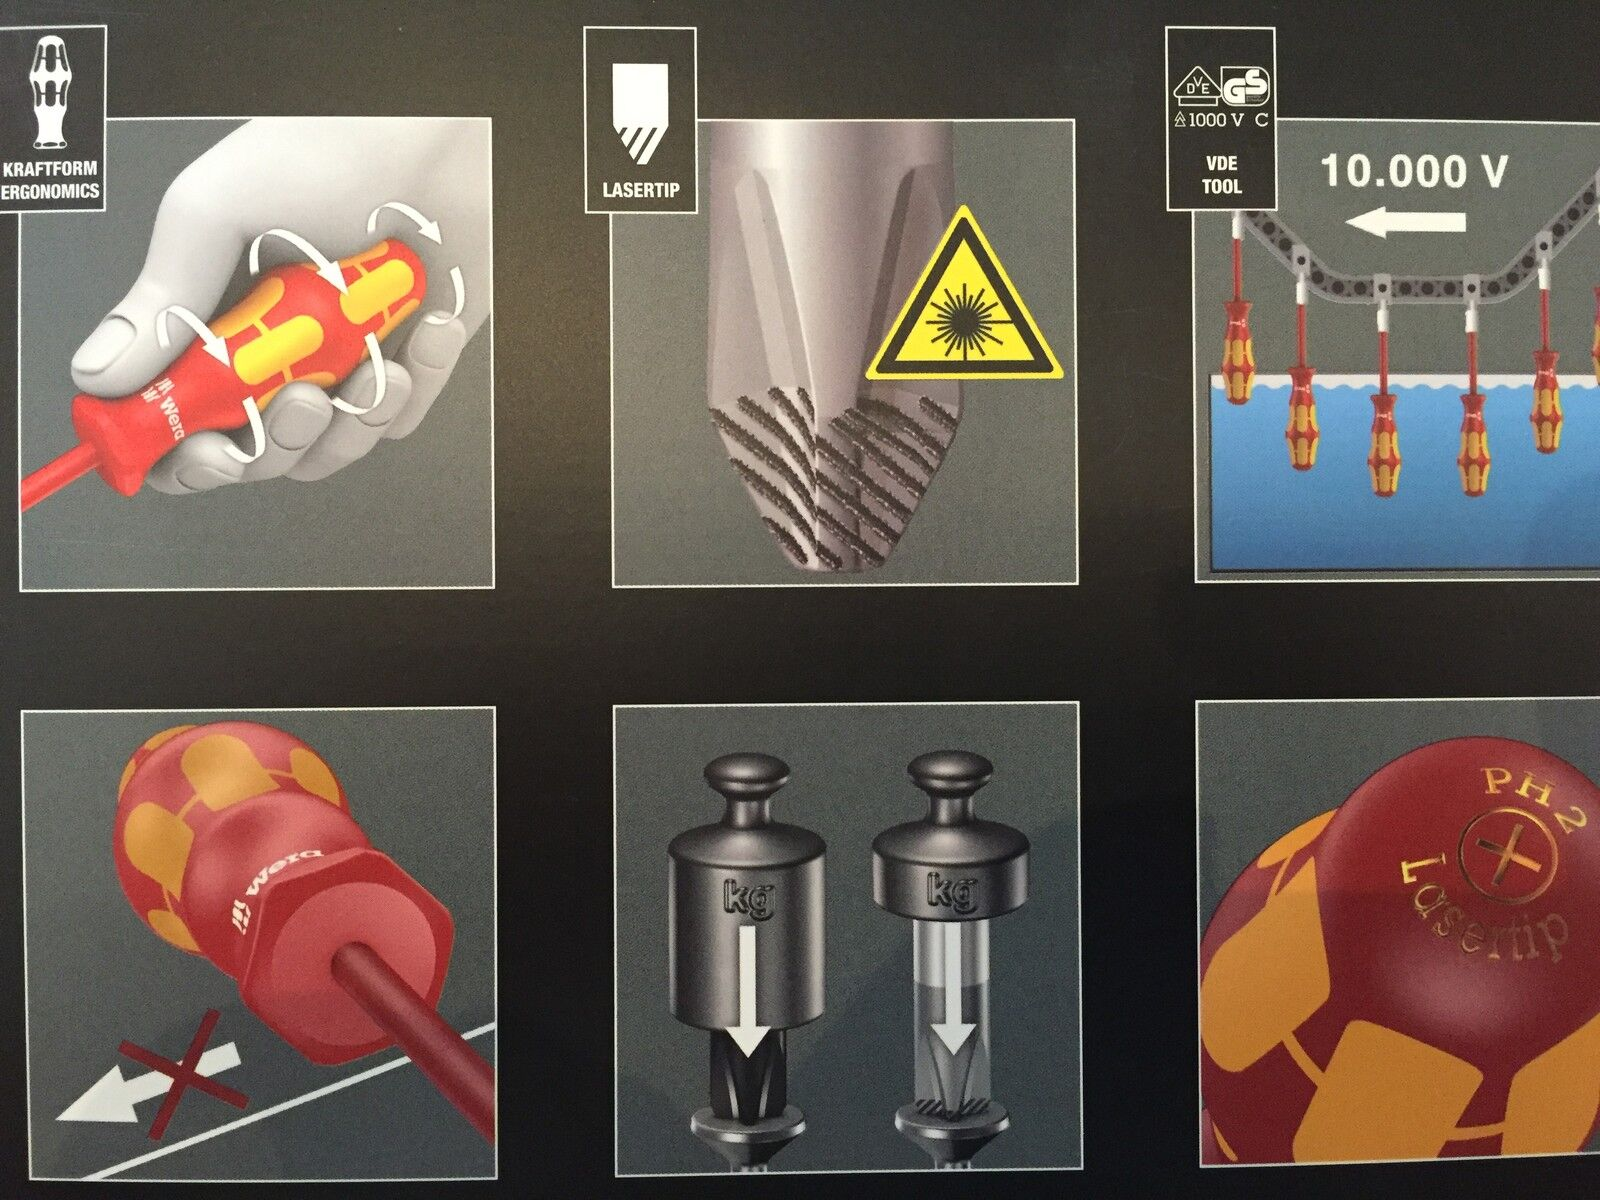 Wera Tools 10 000v Vde Electrical Screwdriver Set With